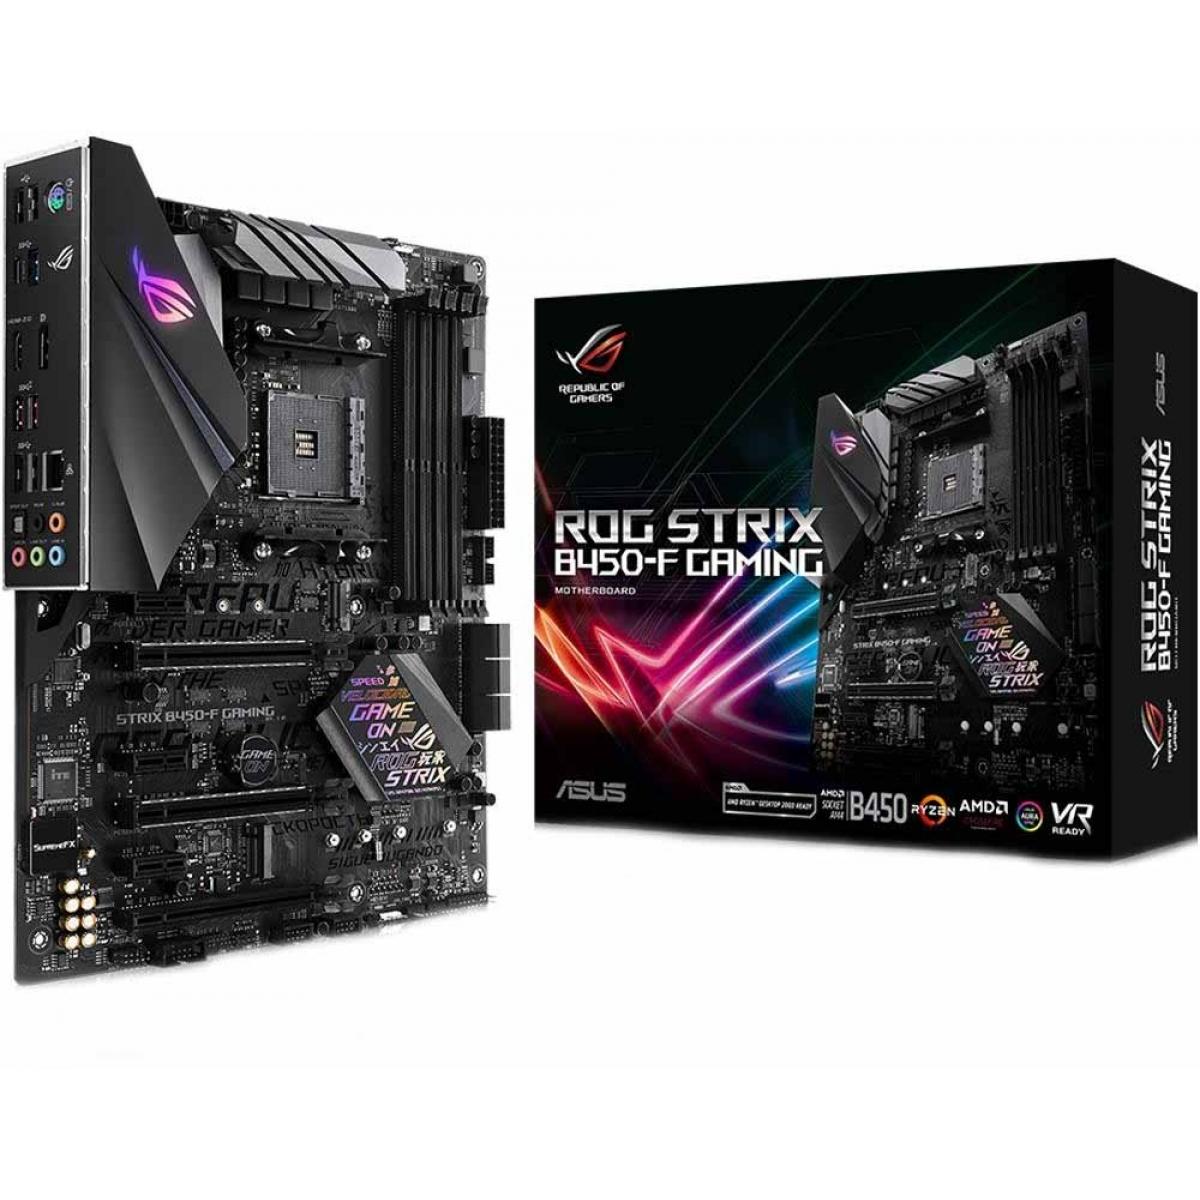 Placa Mãe Asus Rog Strix B450-F GAMING, Chipset B450, AMD AM4, ATX, DDR4